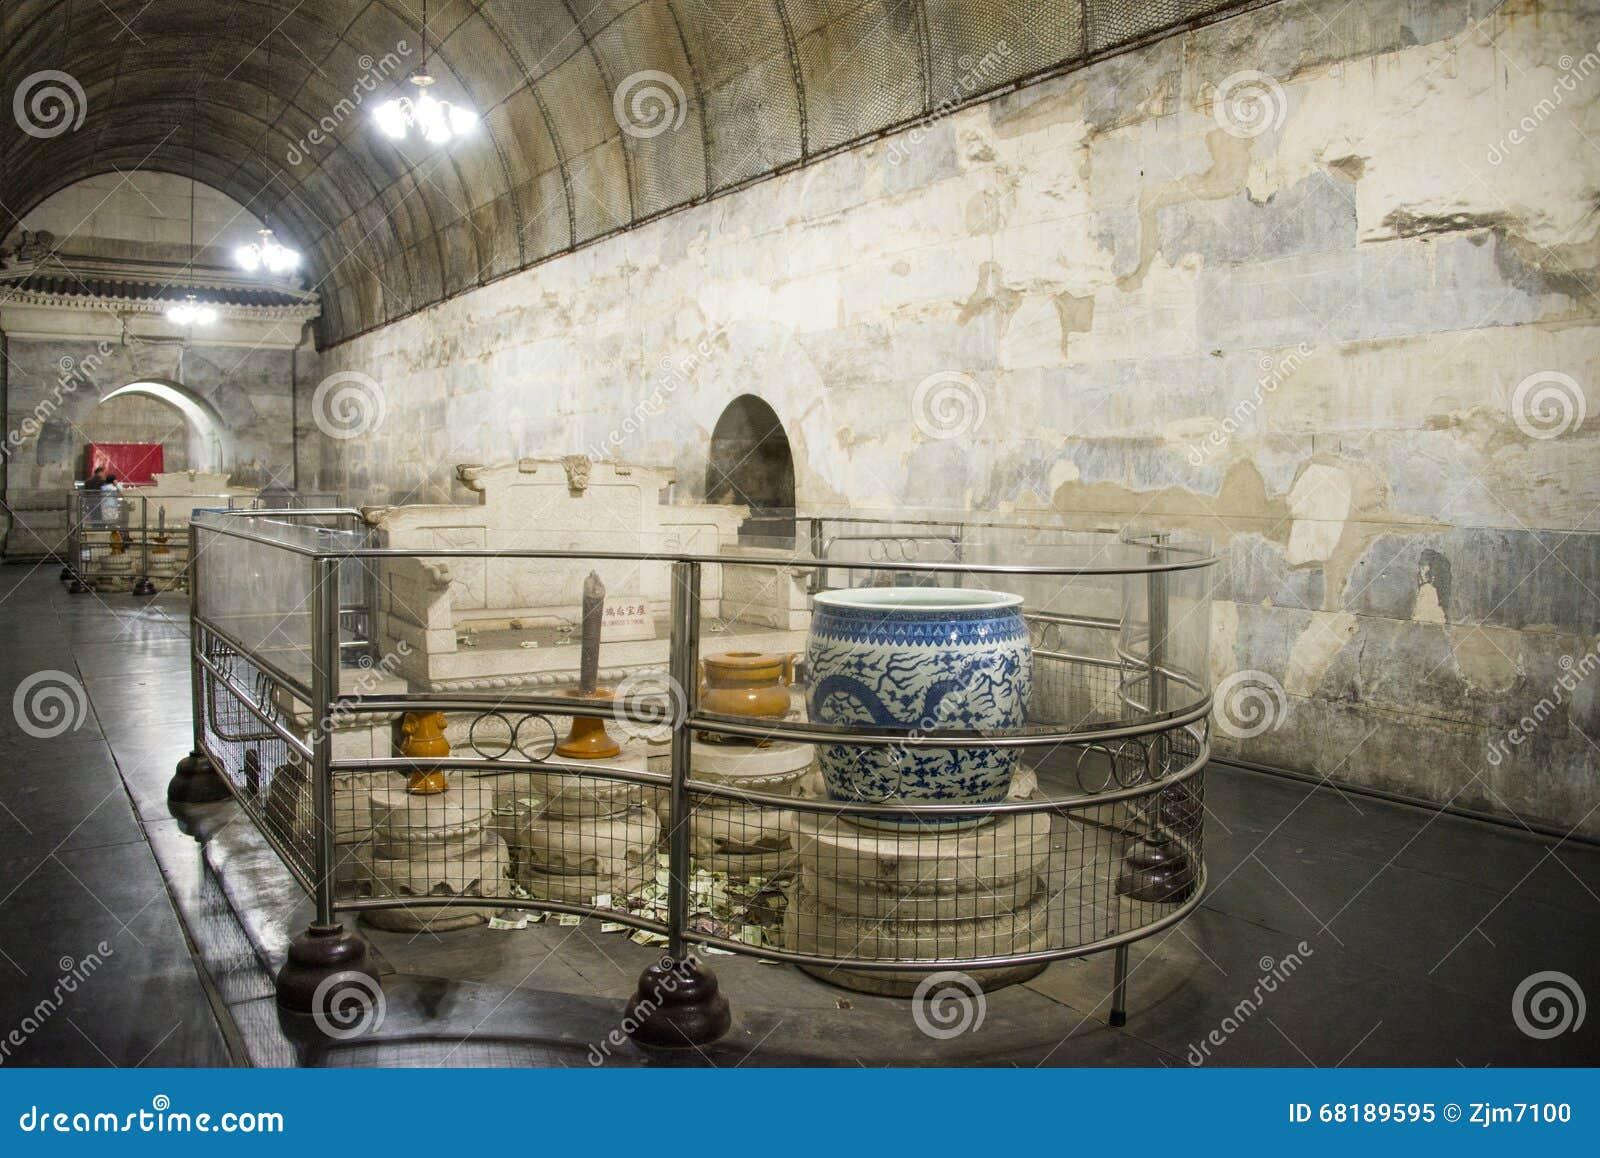 Chinês de Ásia, Pequim, túmulo de ŒUnderground do ¼ do palaceï de Œunderground do ¼ de Ming Dynasty Tombsï